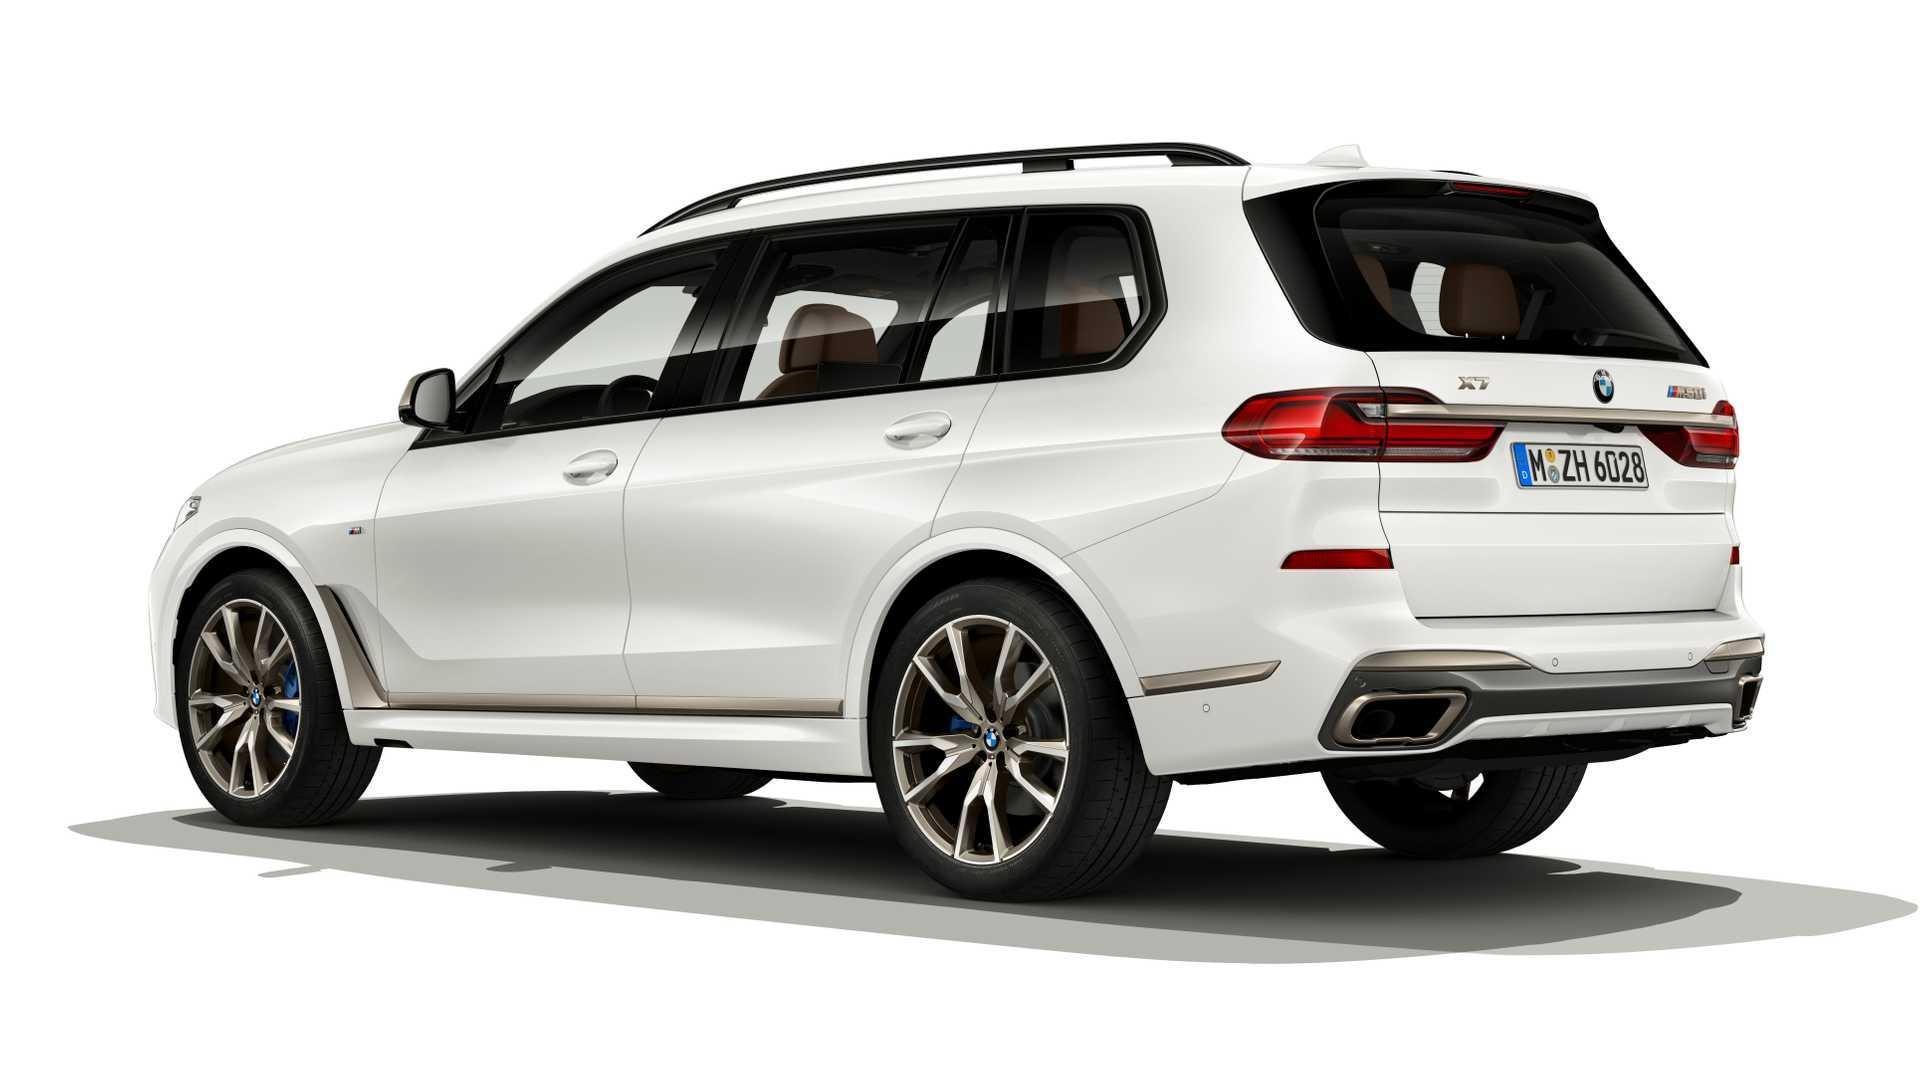 2020 Bmw X5 M50i X7 M50i Performance Variants Revealed Performancedrive